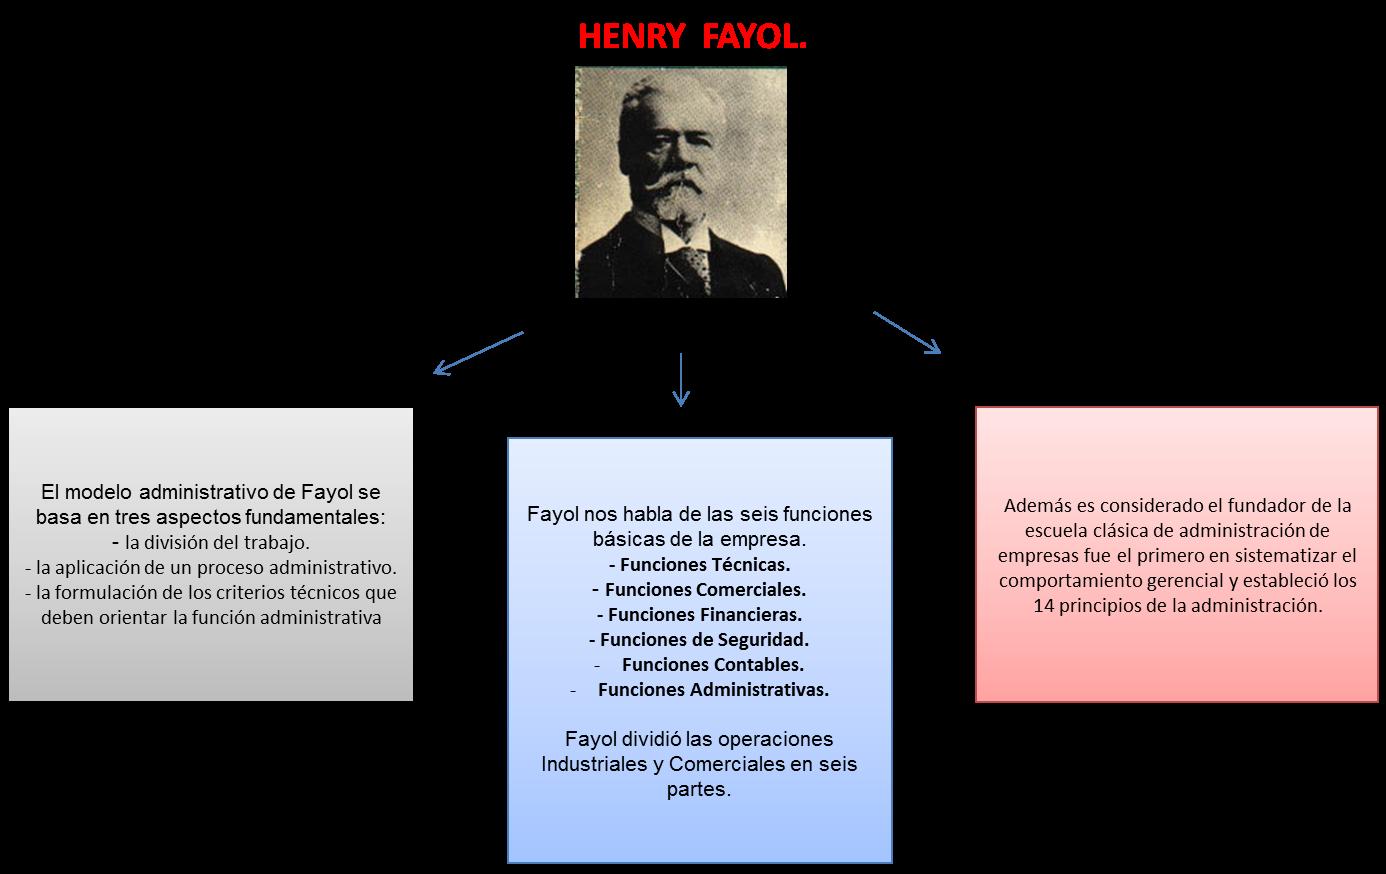 la vida de henry fayol: